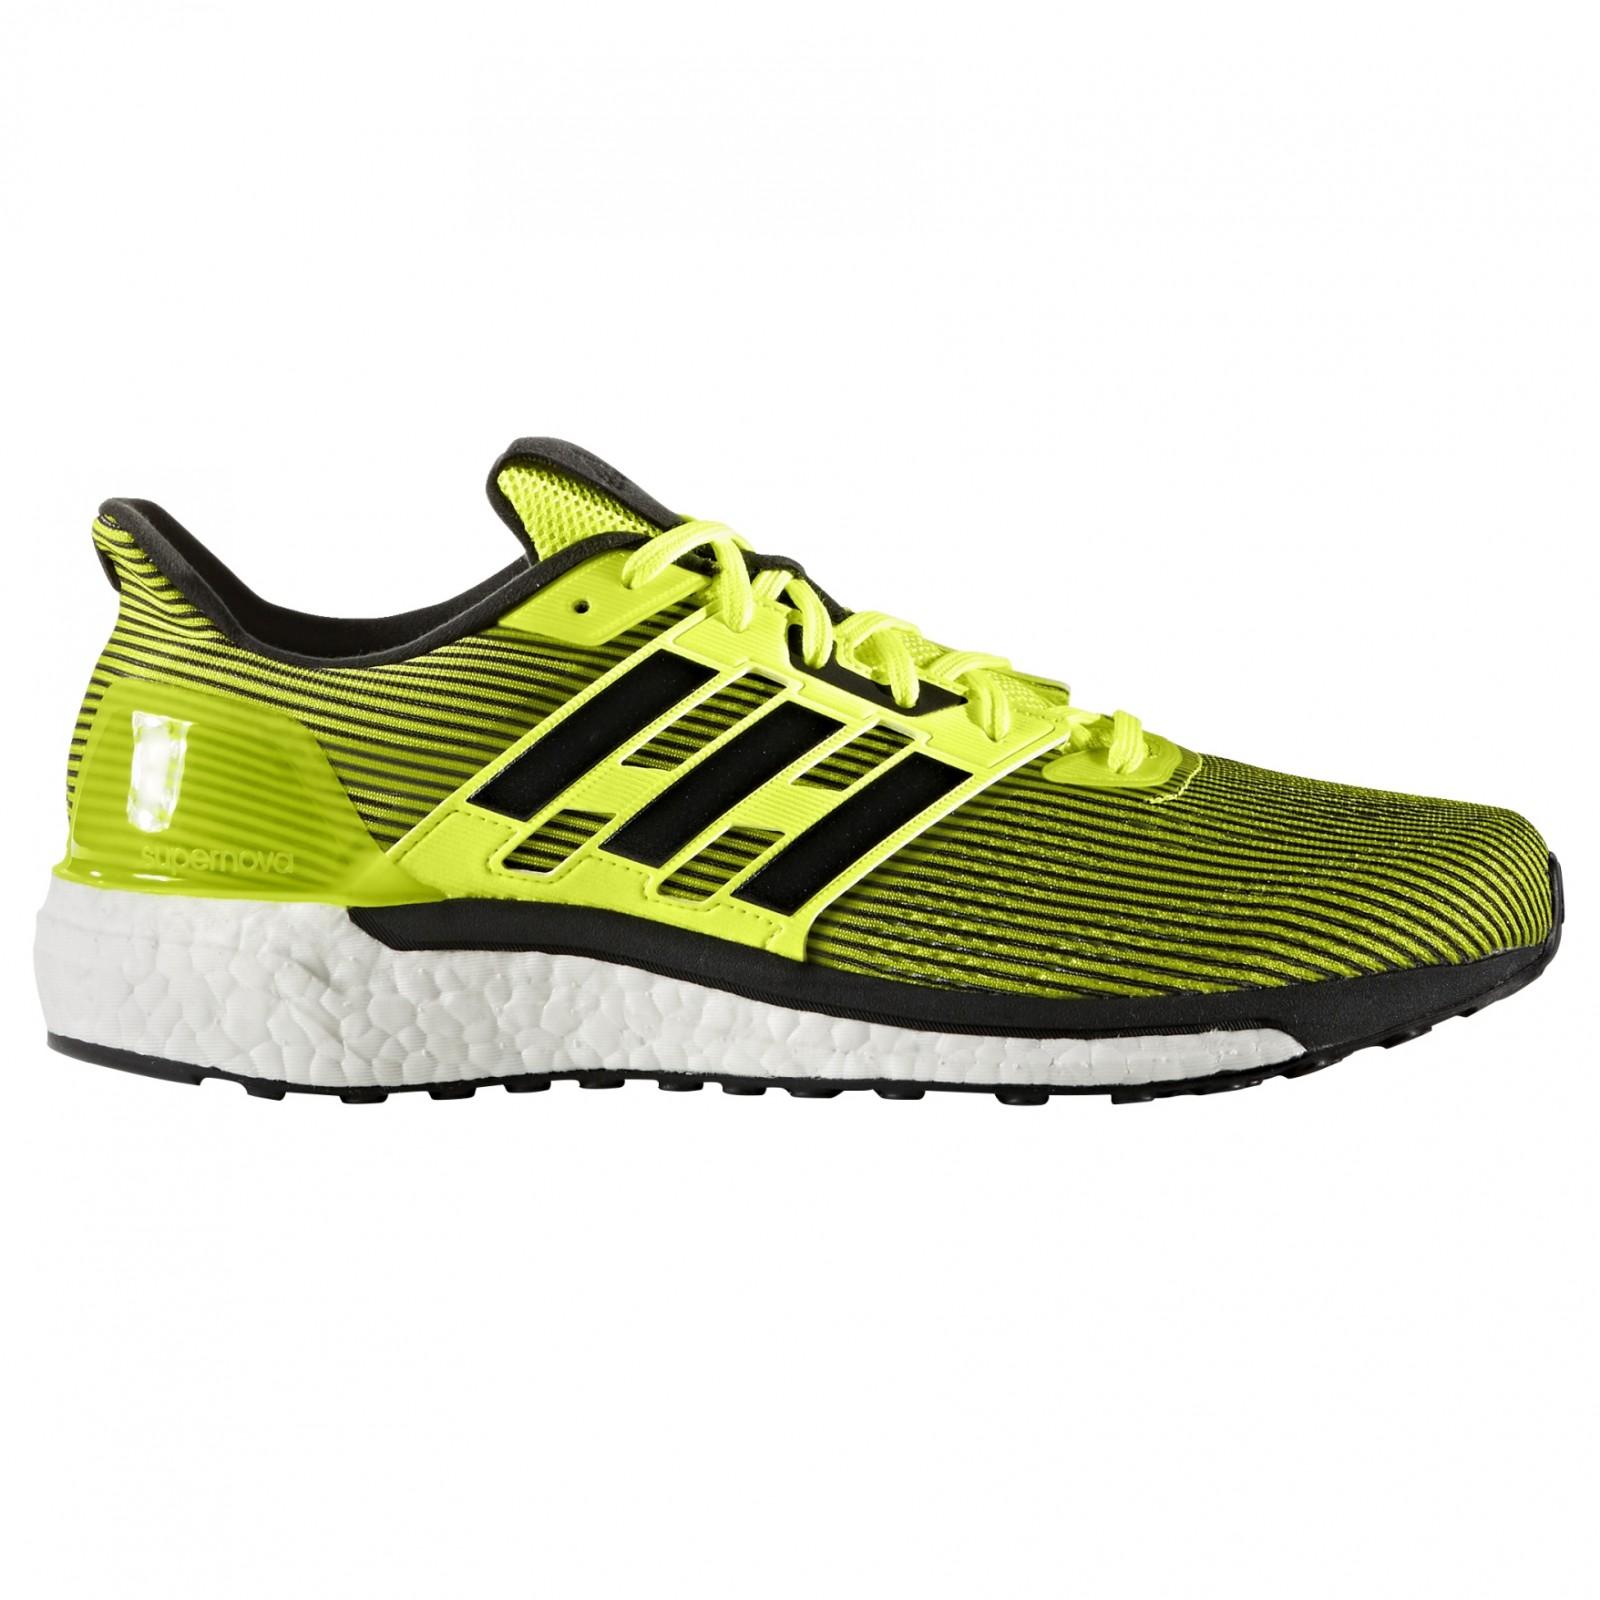 Pánské běžecké boty adidas supernova m  c01d80efdc6